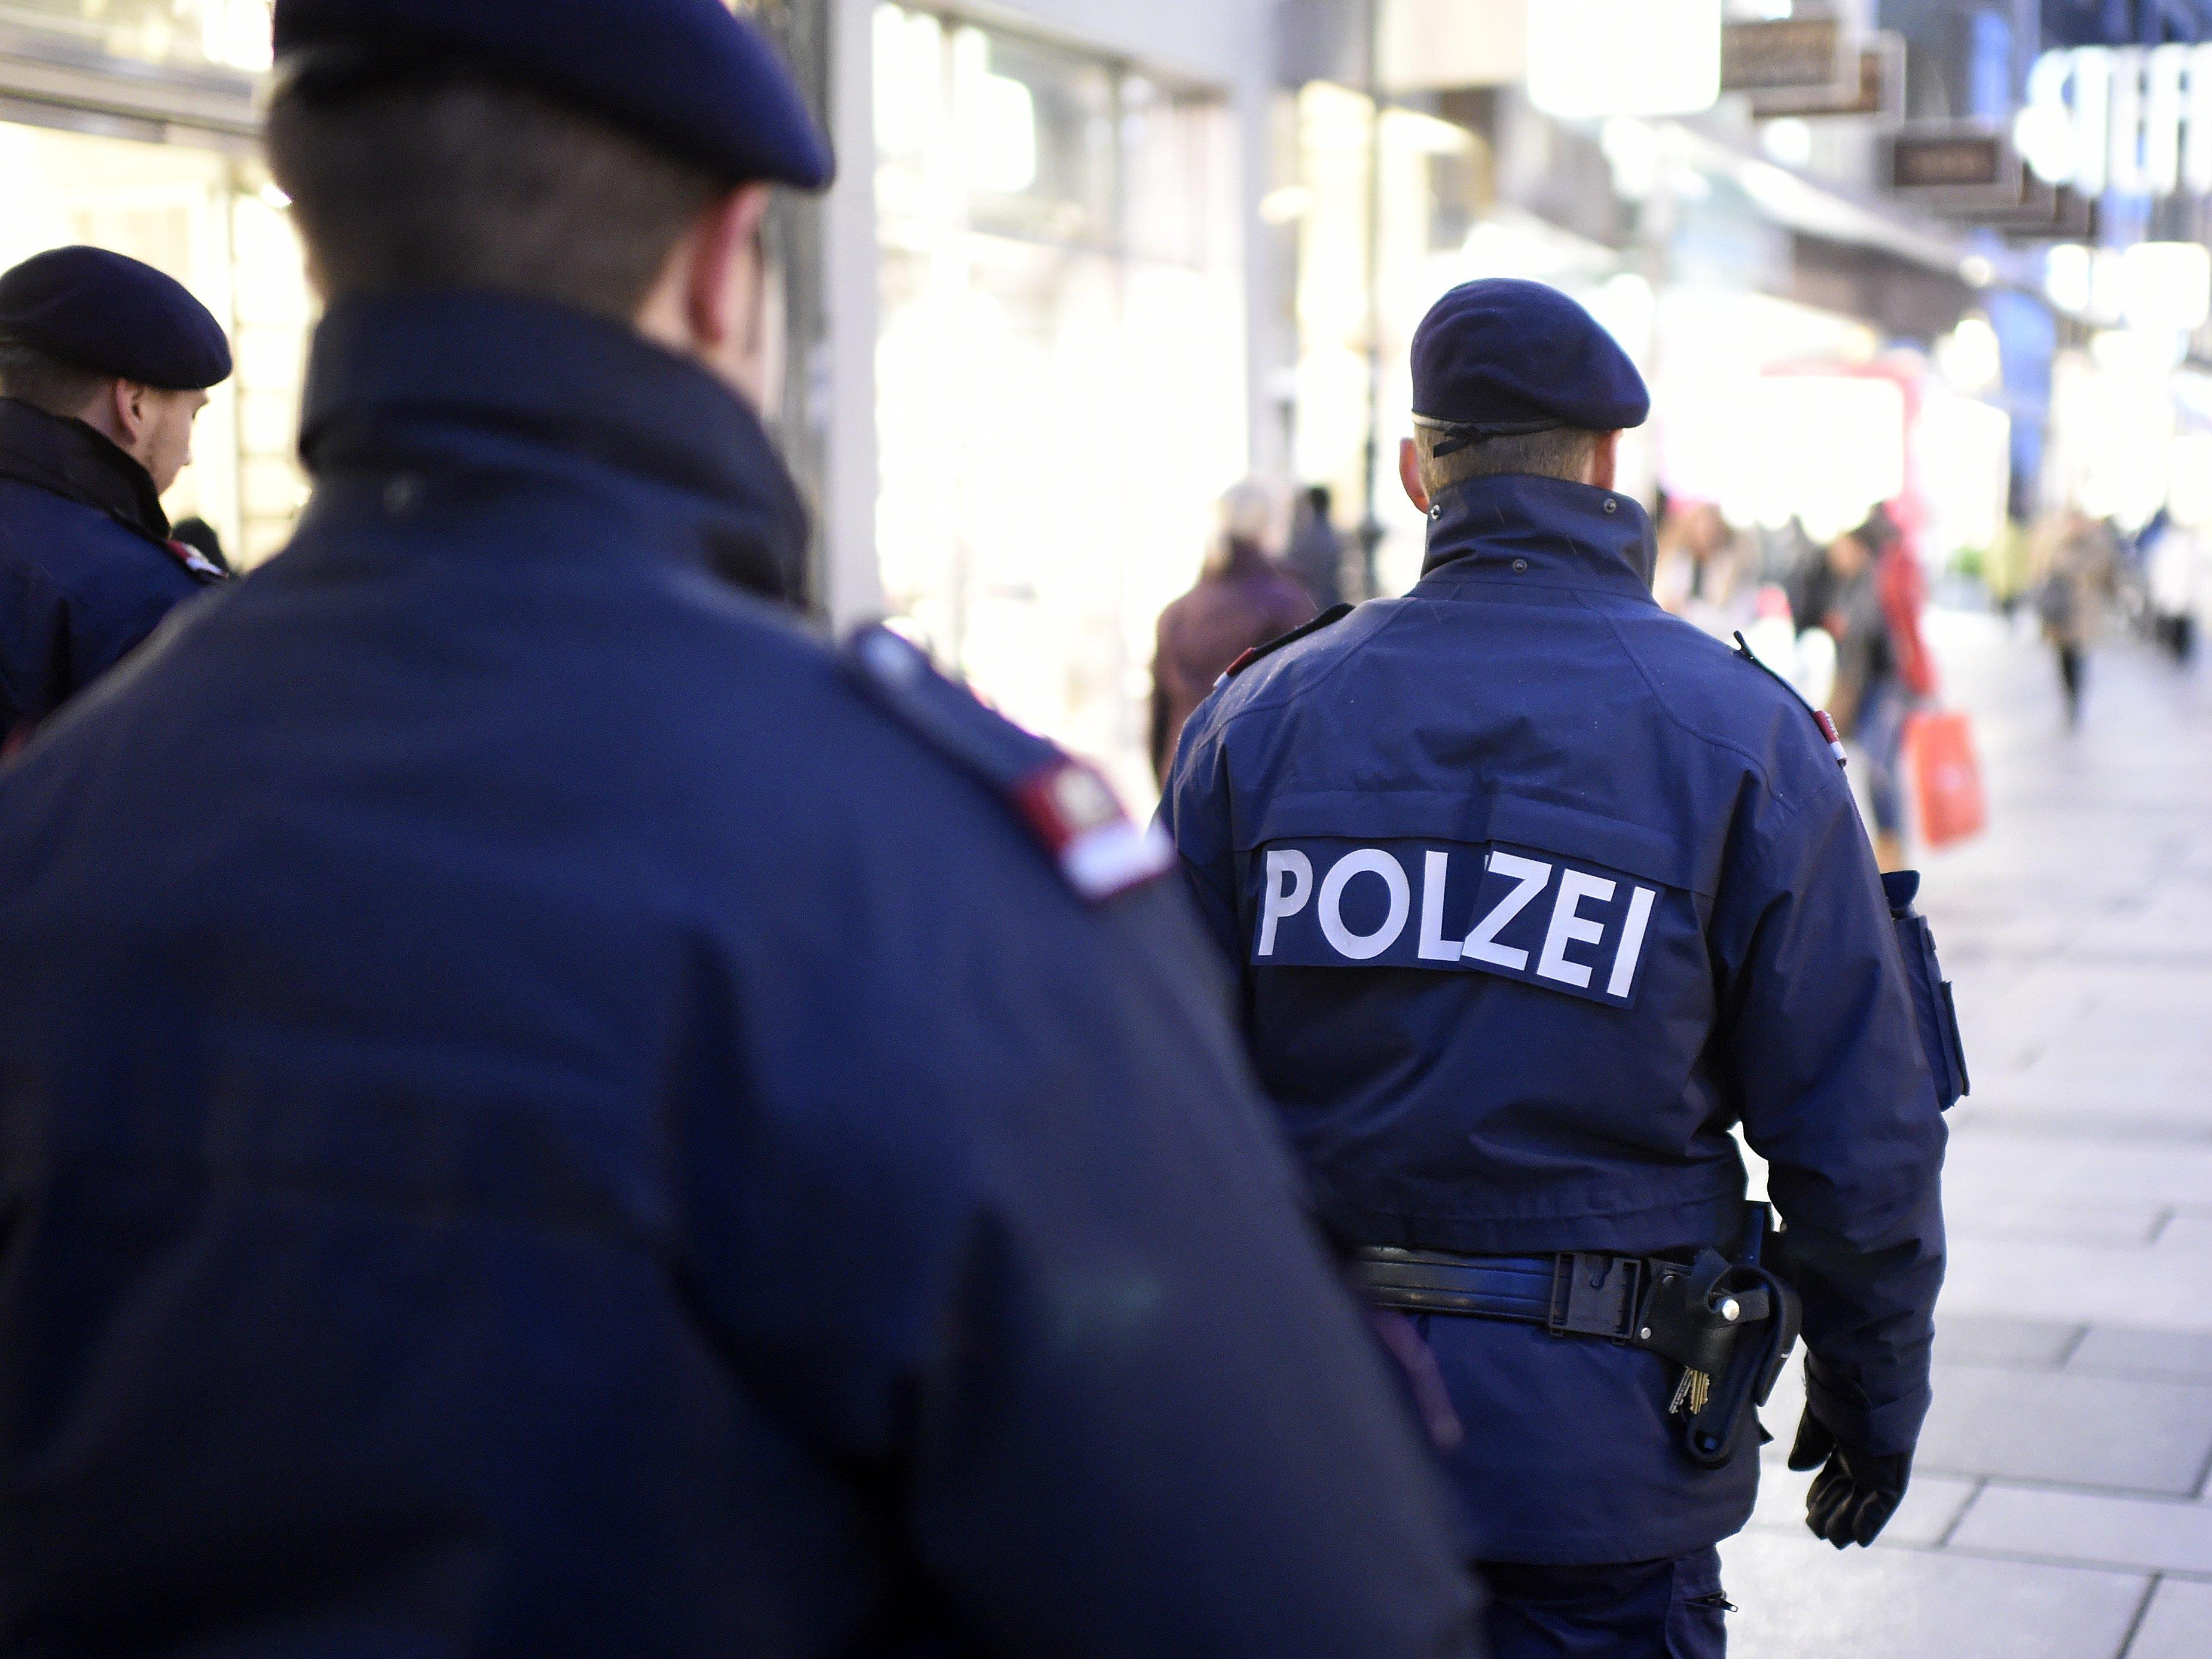 Festnahme eines Bodypackers am Wiener Schottenring.